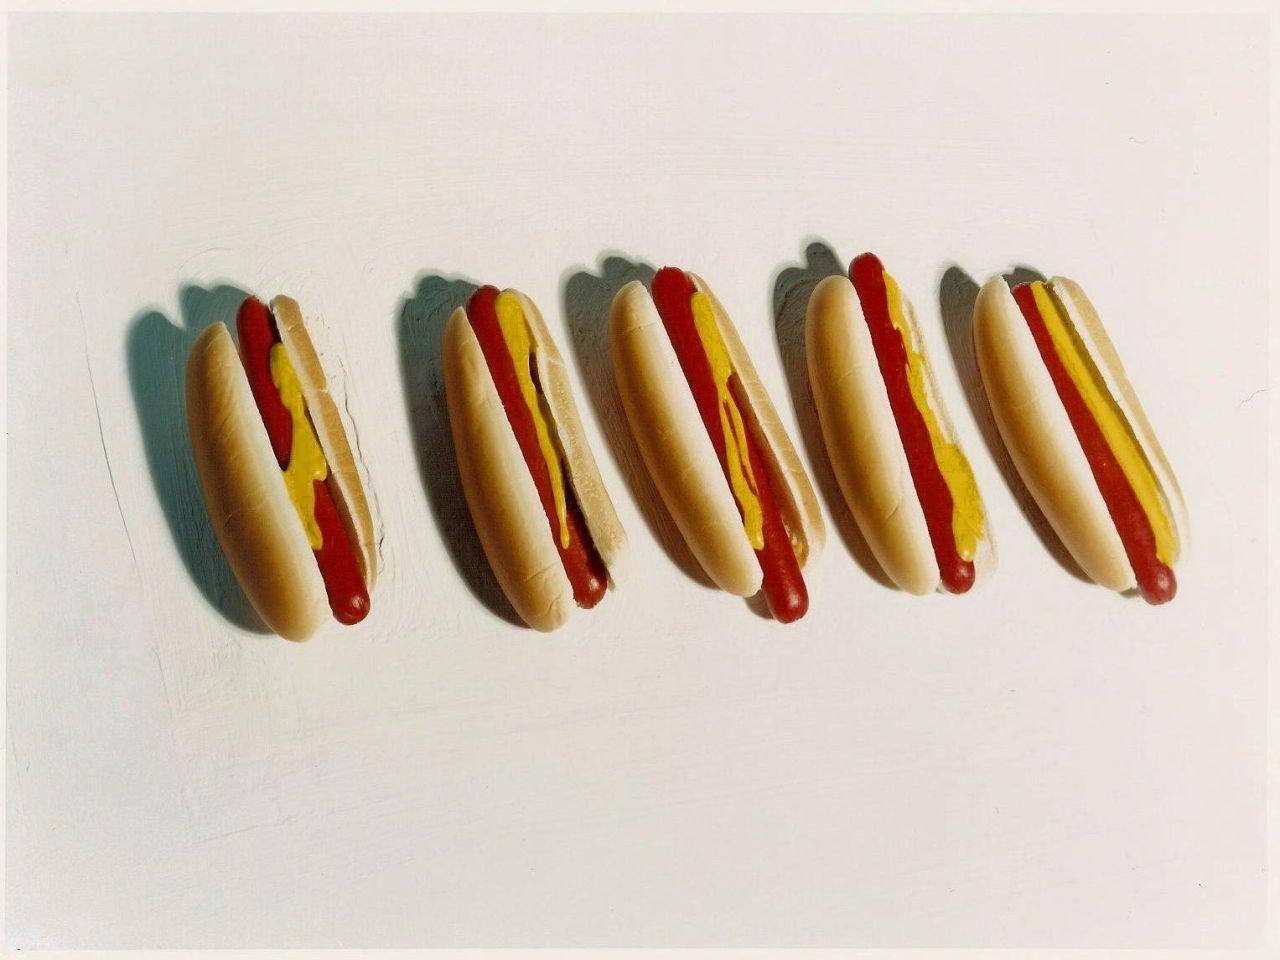 Hot Dog Sweets